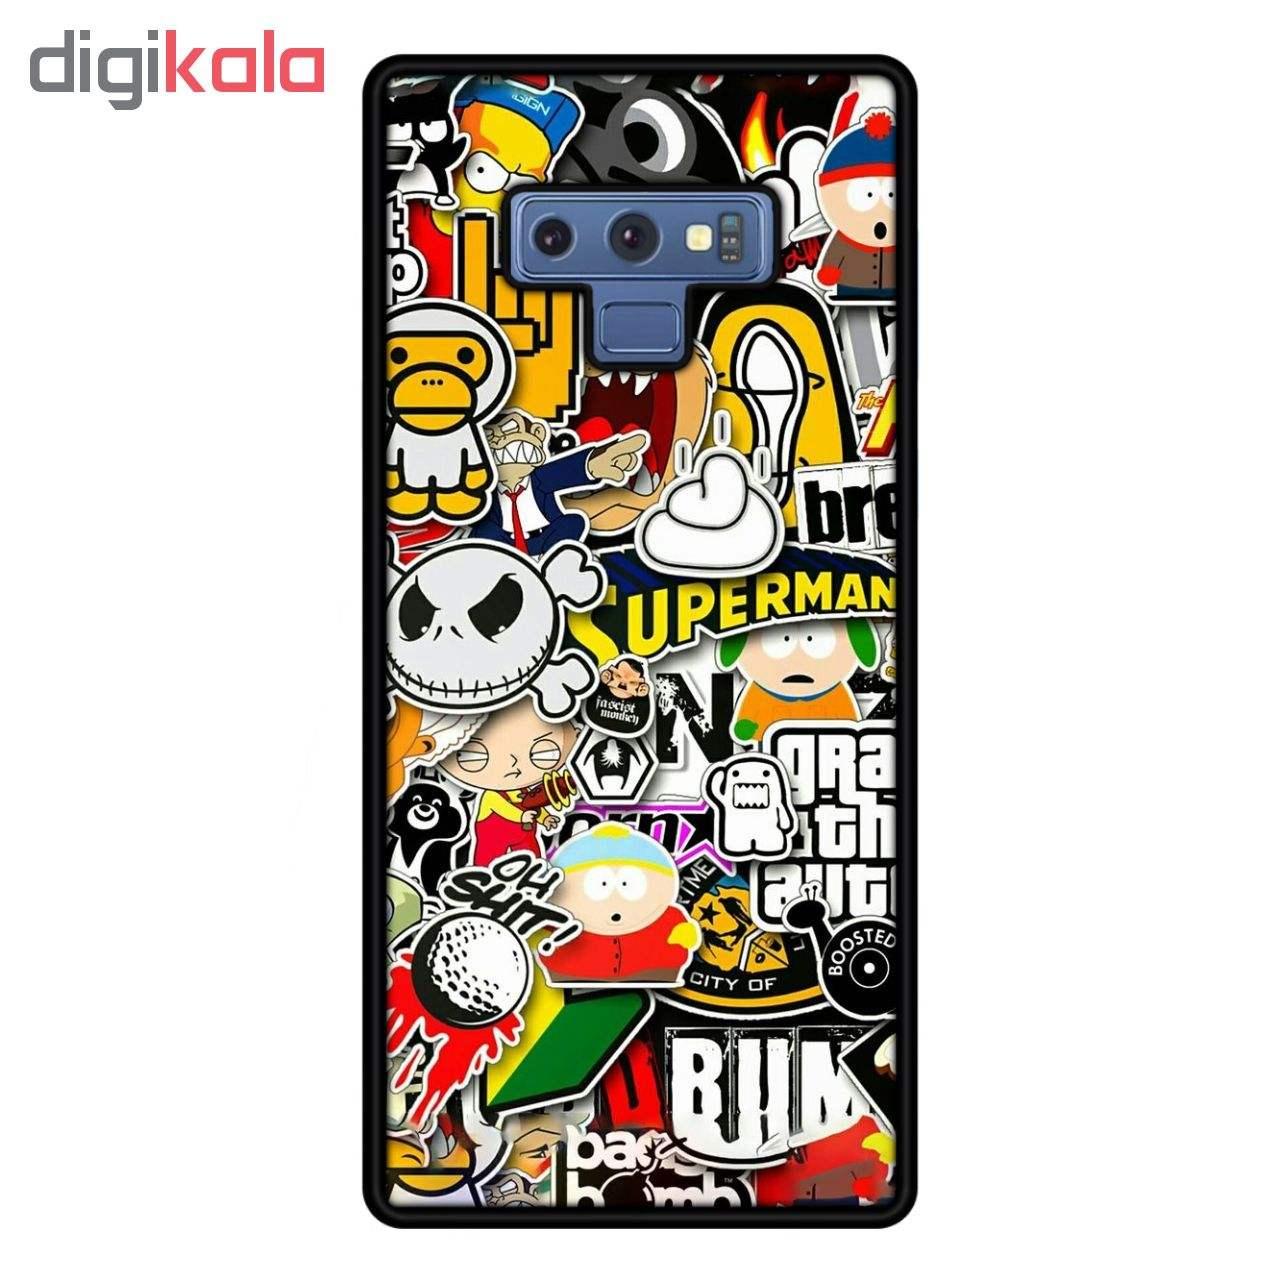 کاور آکام مدل AN90056 مناسب برای گوشی موبایل سامسونگ Galaxy Note 9 main 1 1